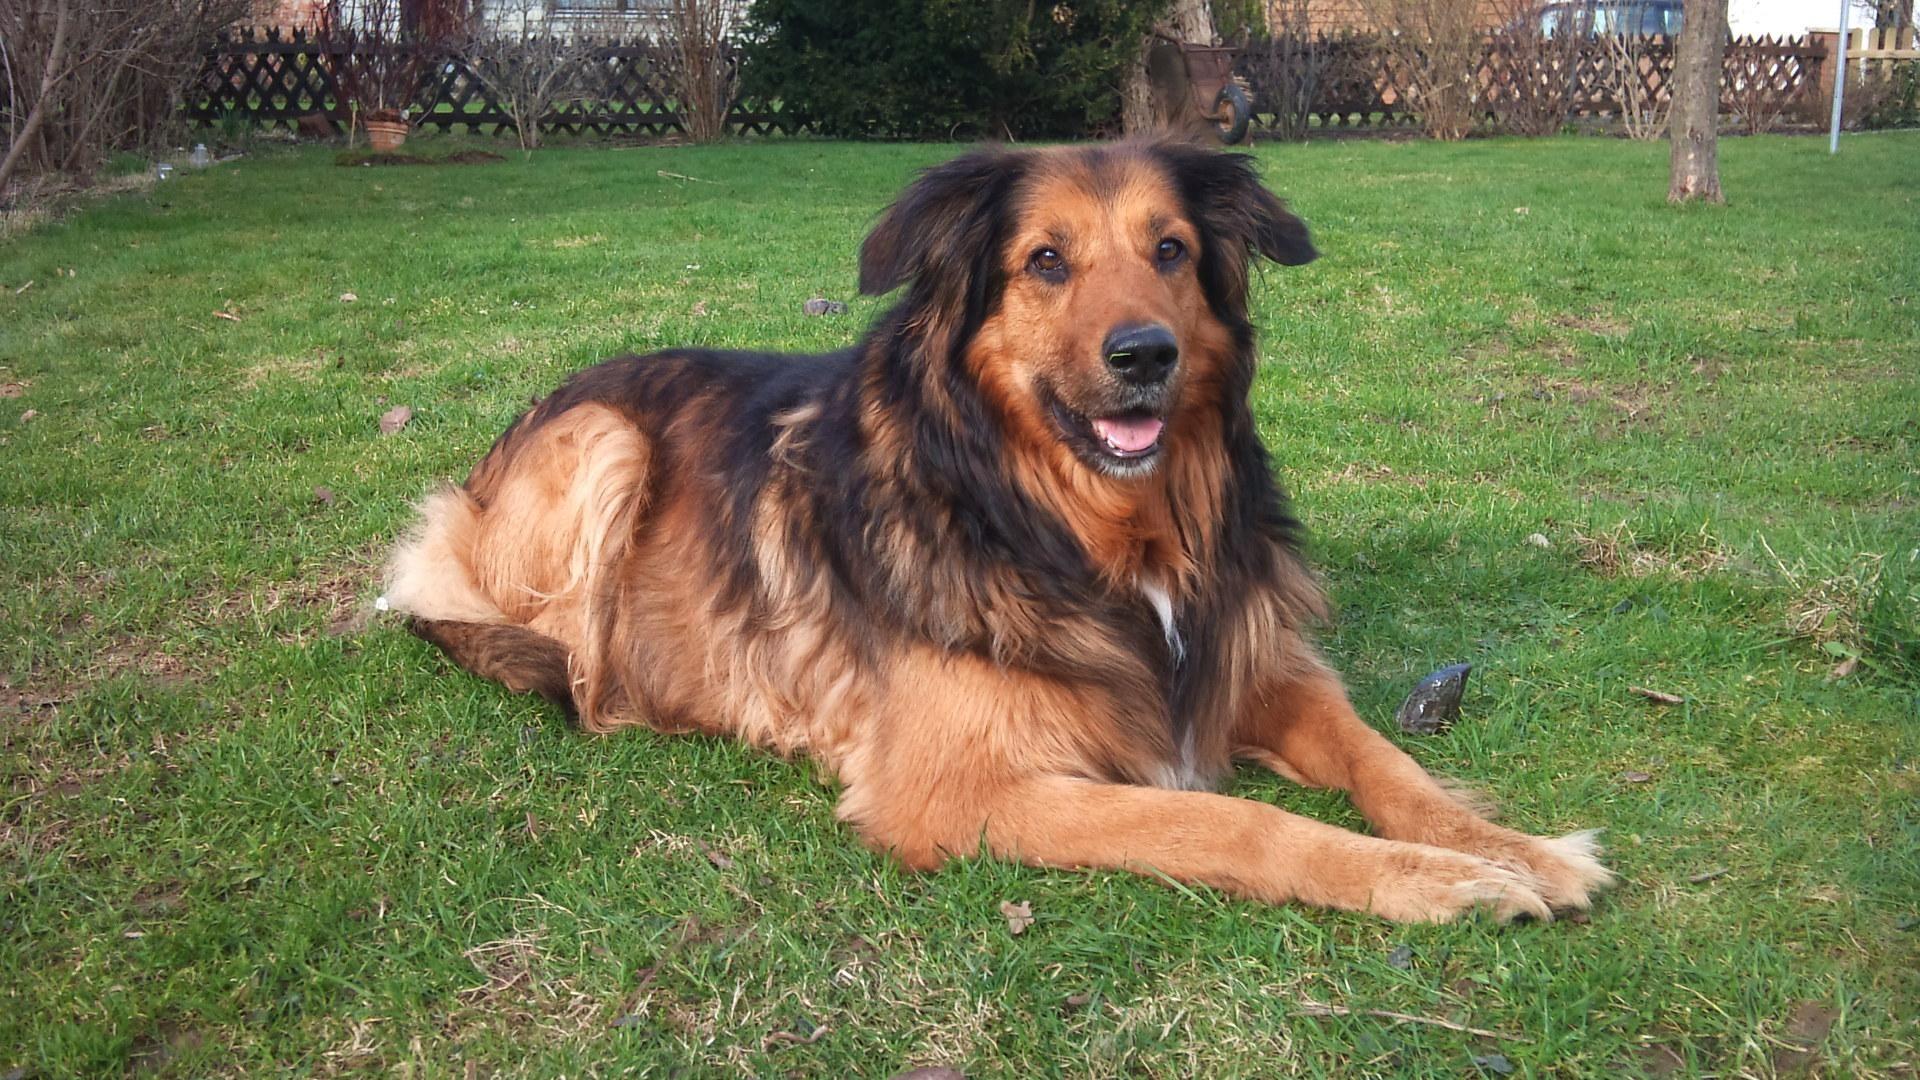 Luna Collie / German Shepherd / Hovawart mix Hunde